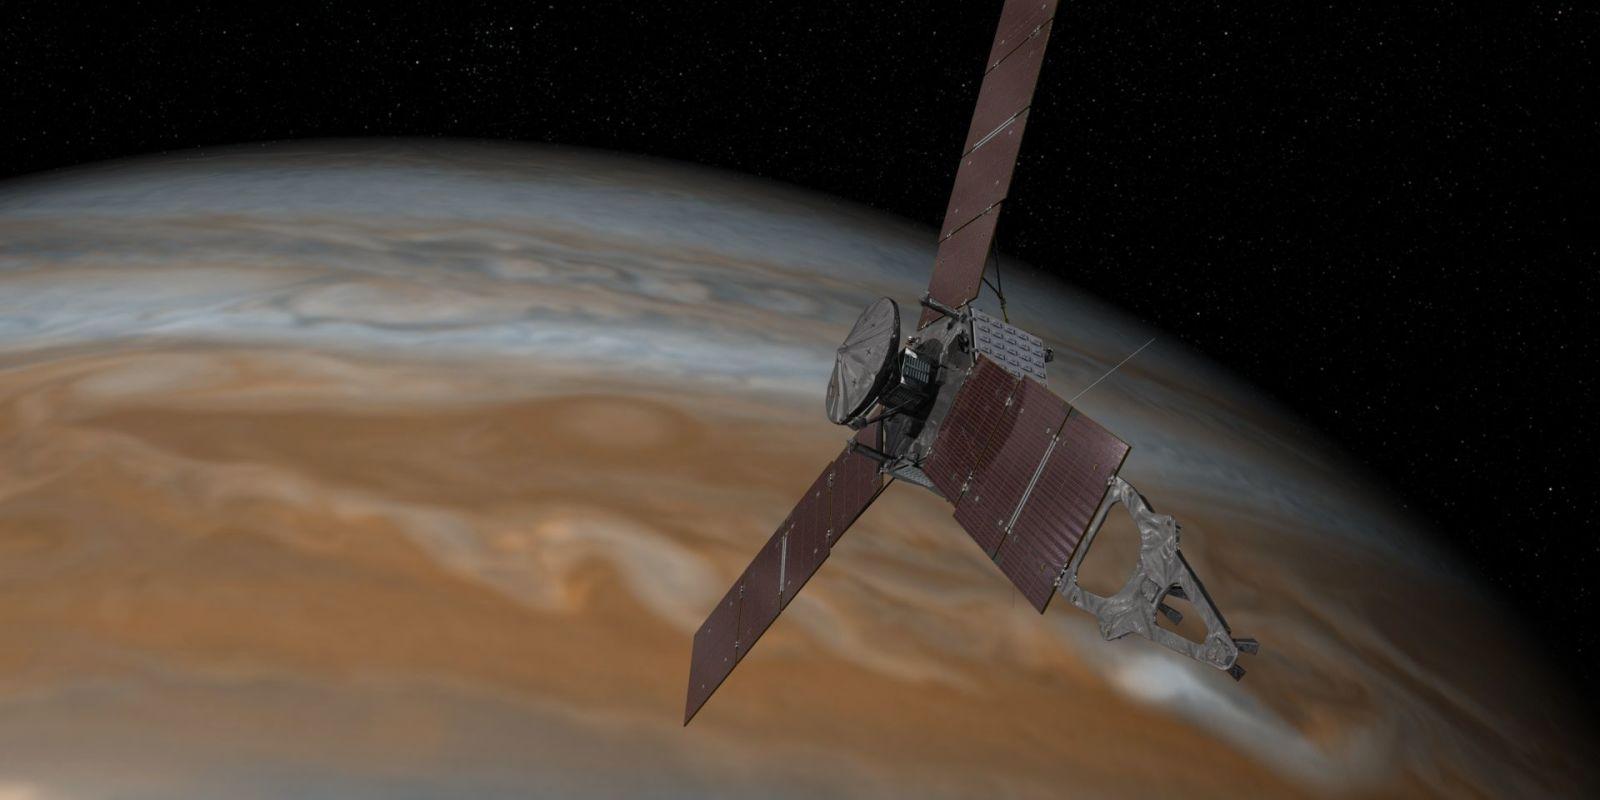 NASA's Juno Spacecraft Malfunctioned While In Orbit Around Jupiter